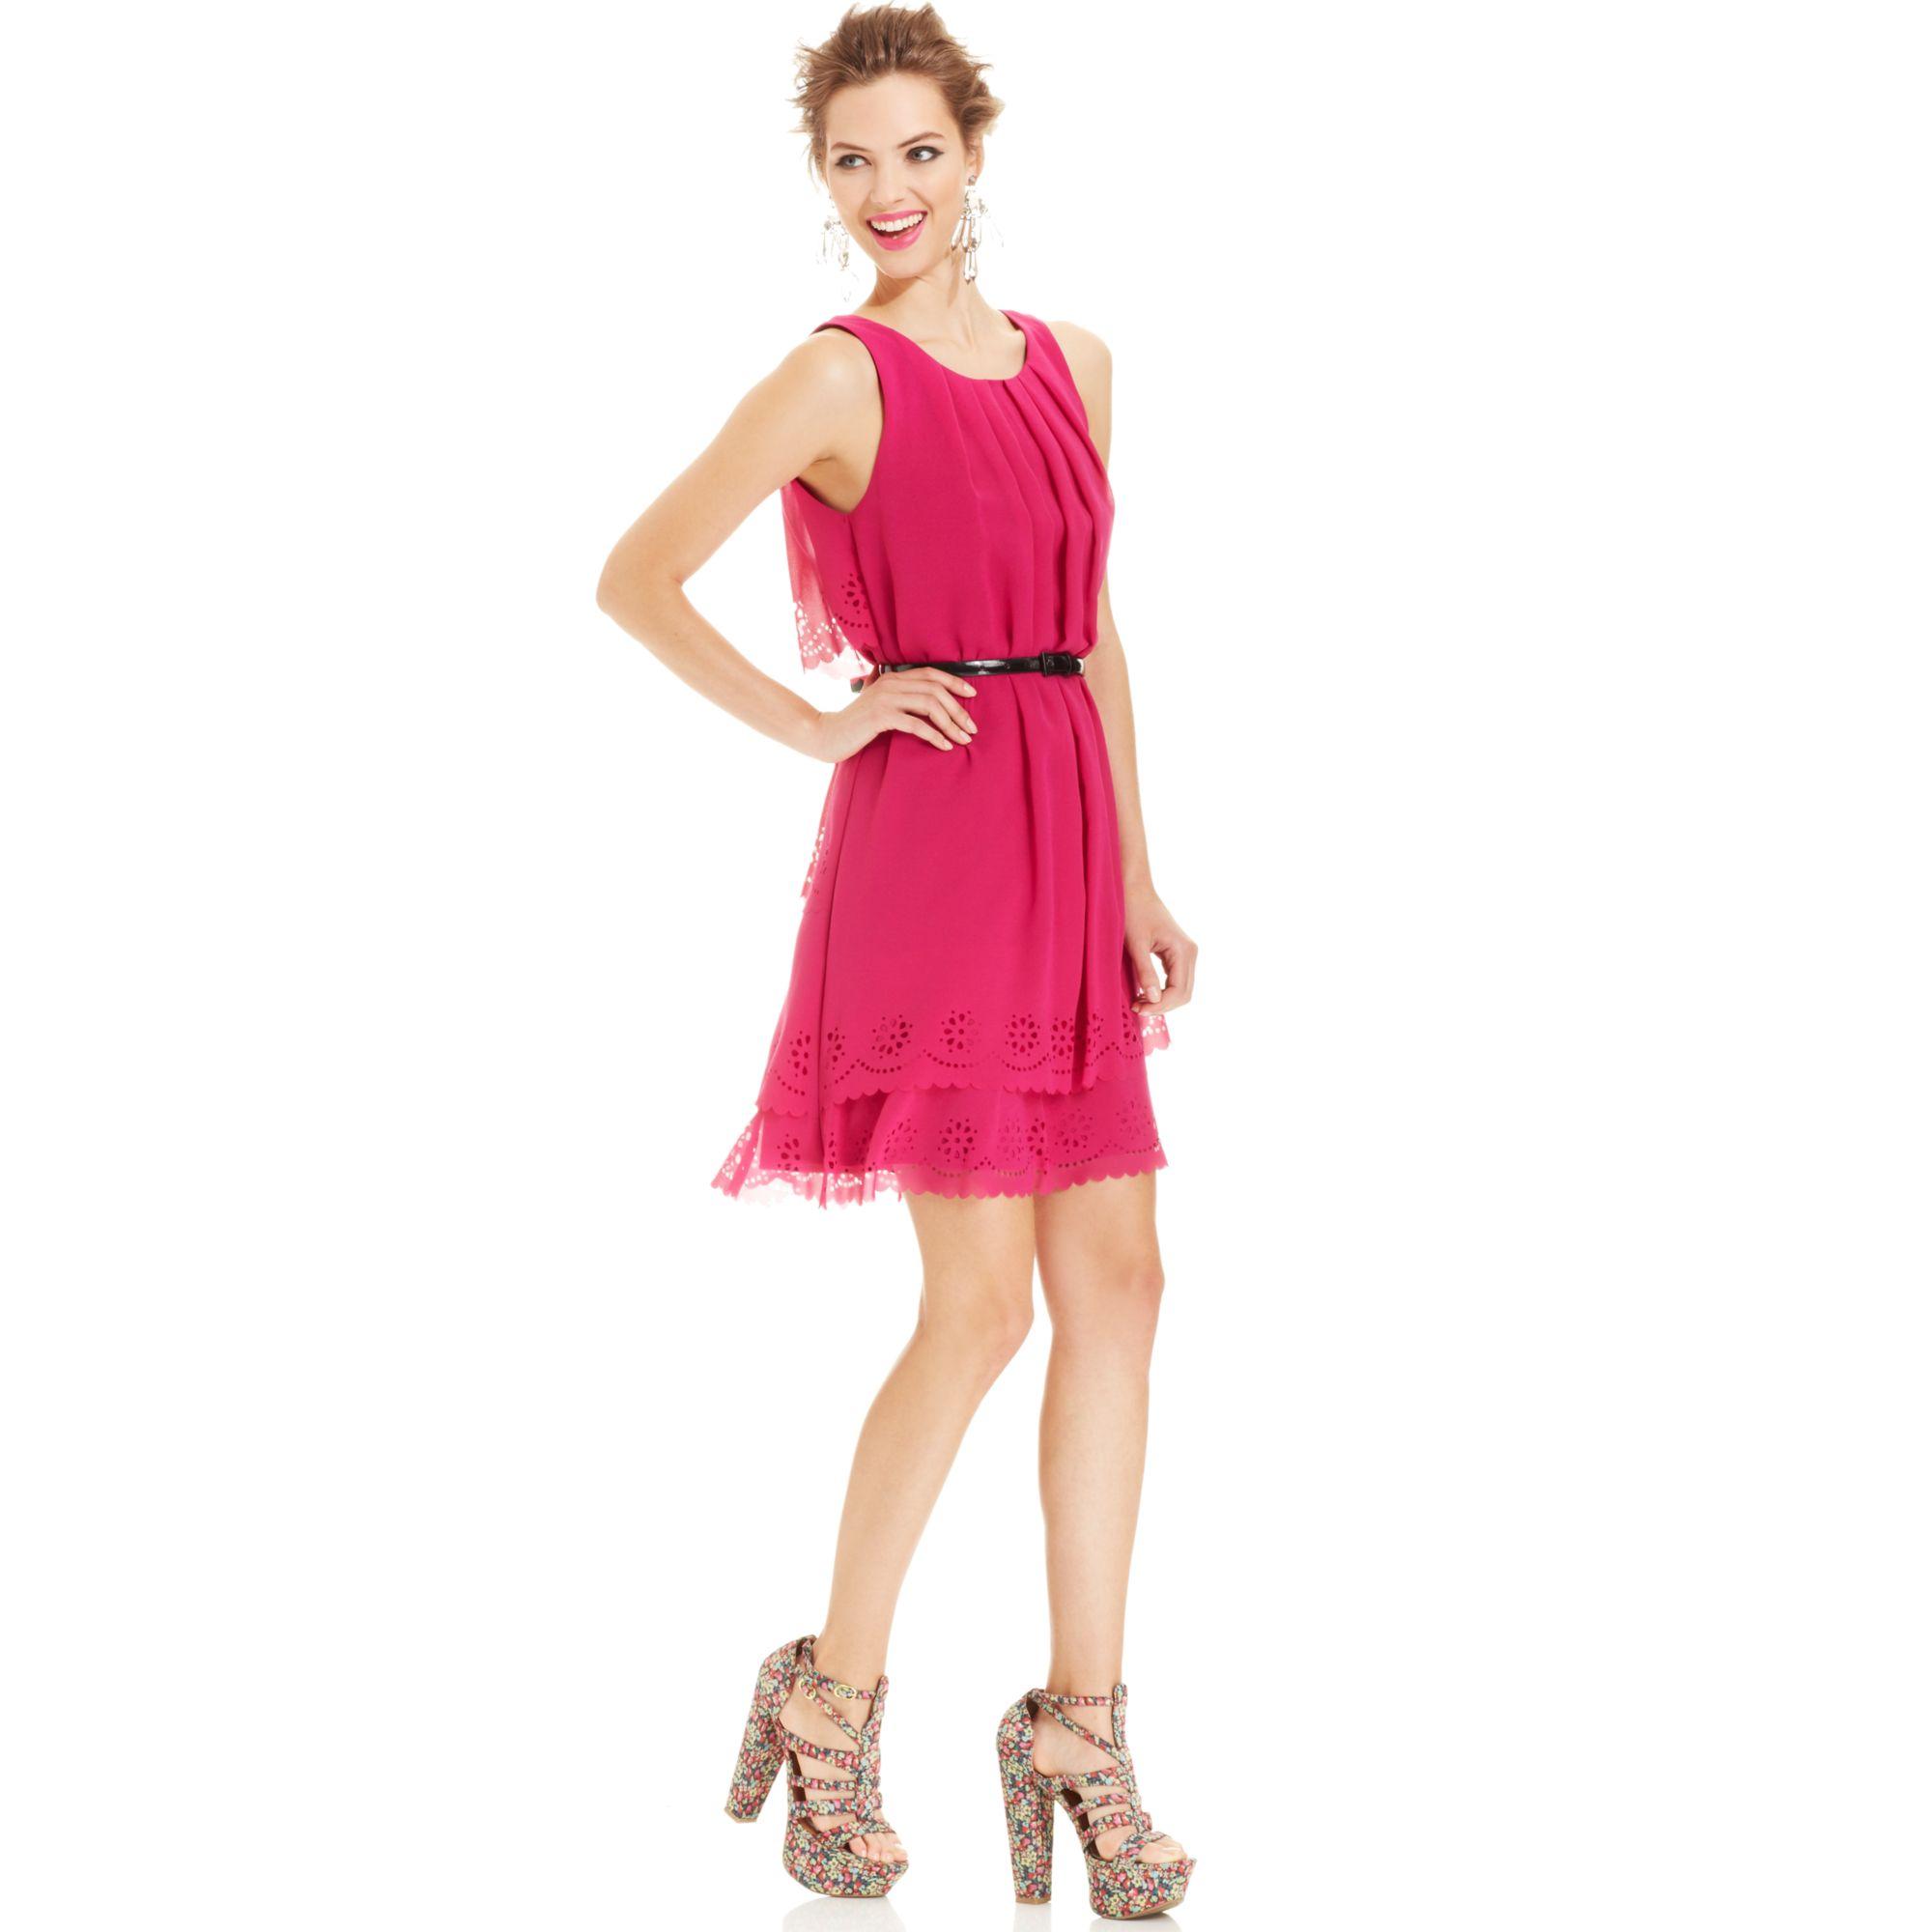 Laser Cut Dress Designs